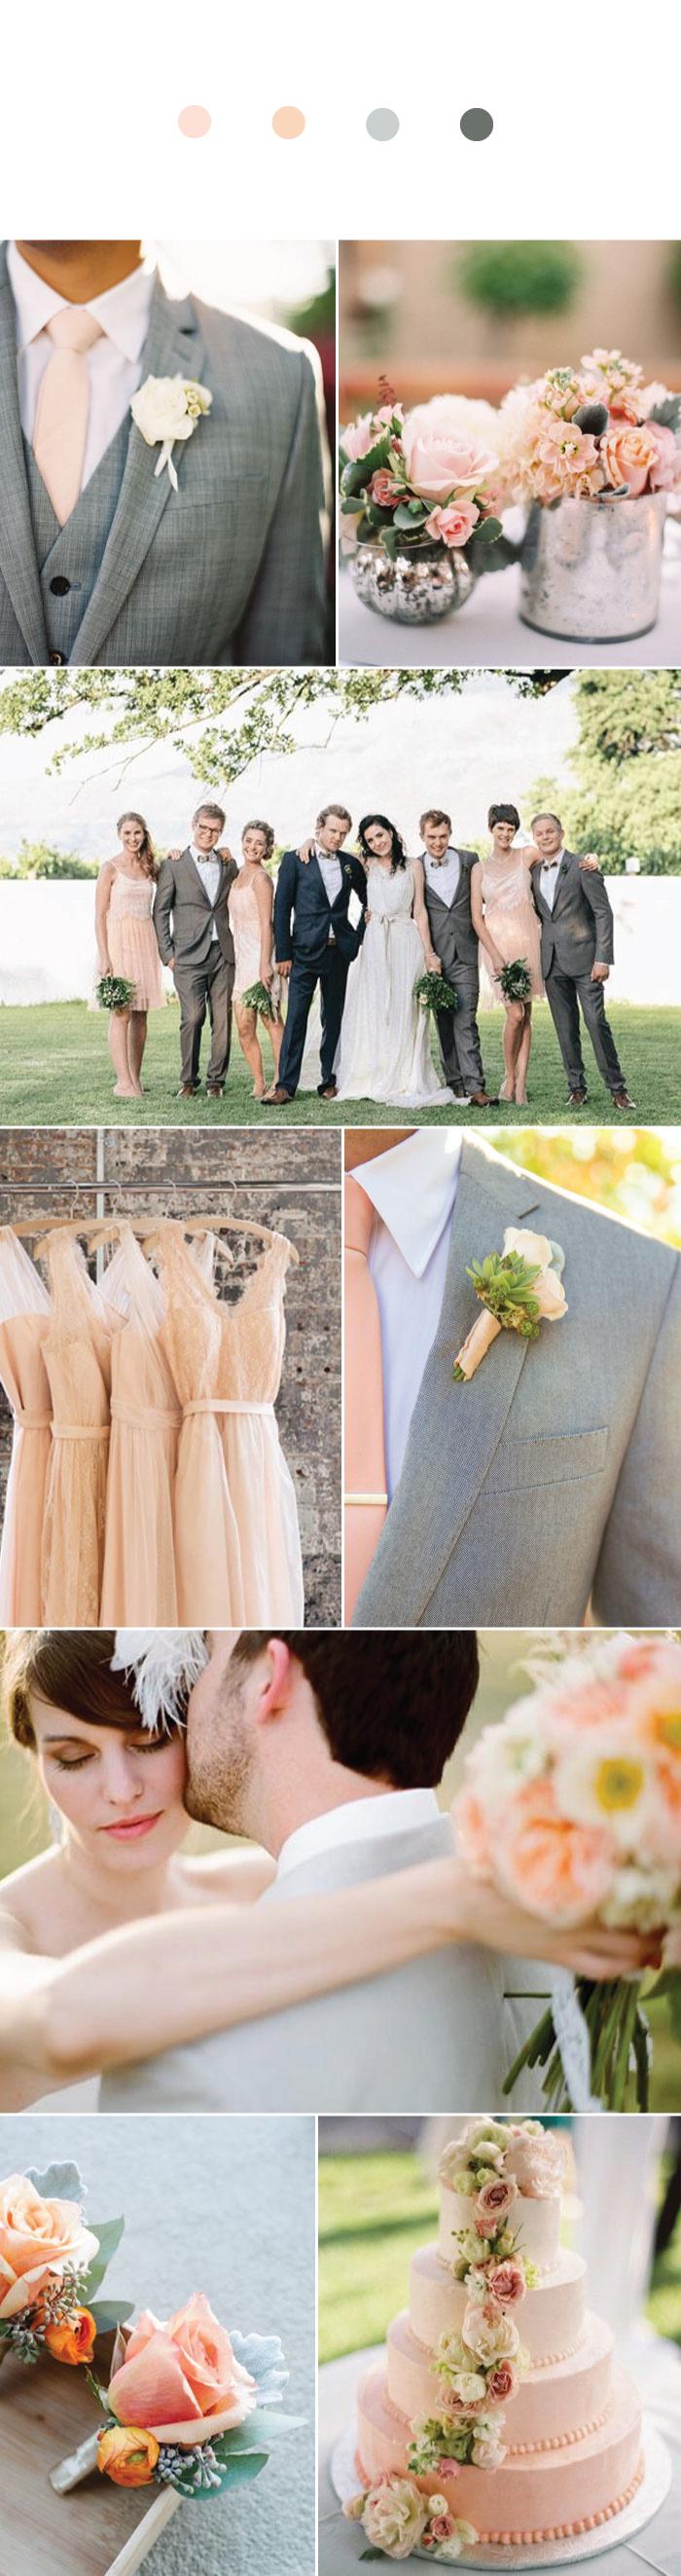 Peach + Gray Wedding Inspiration